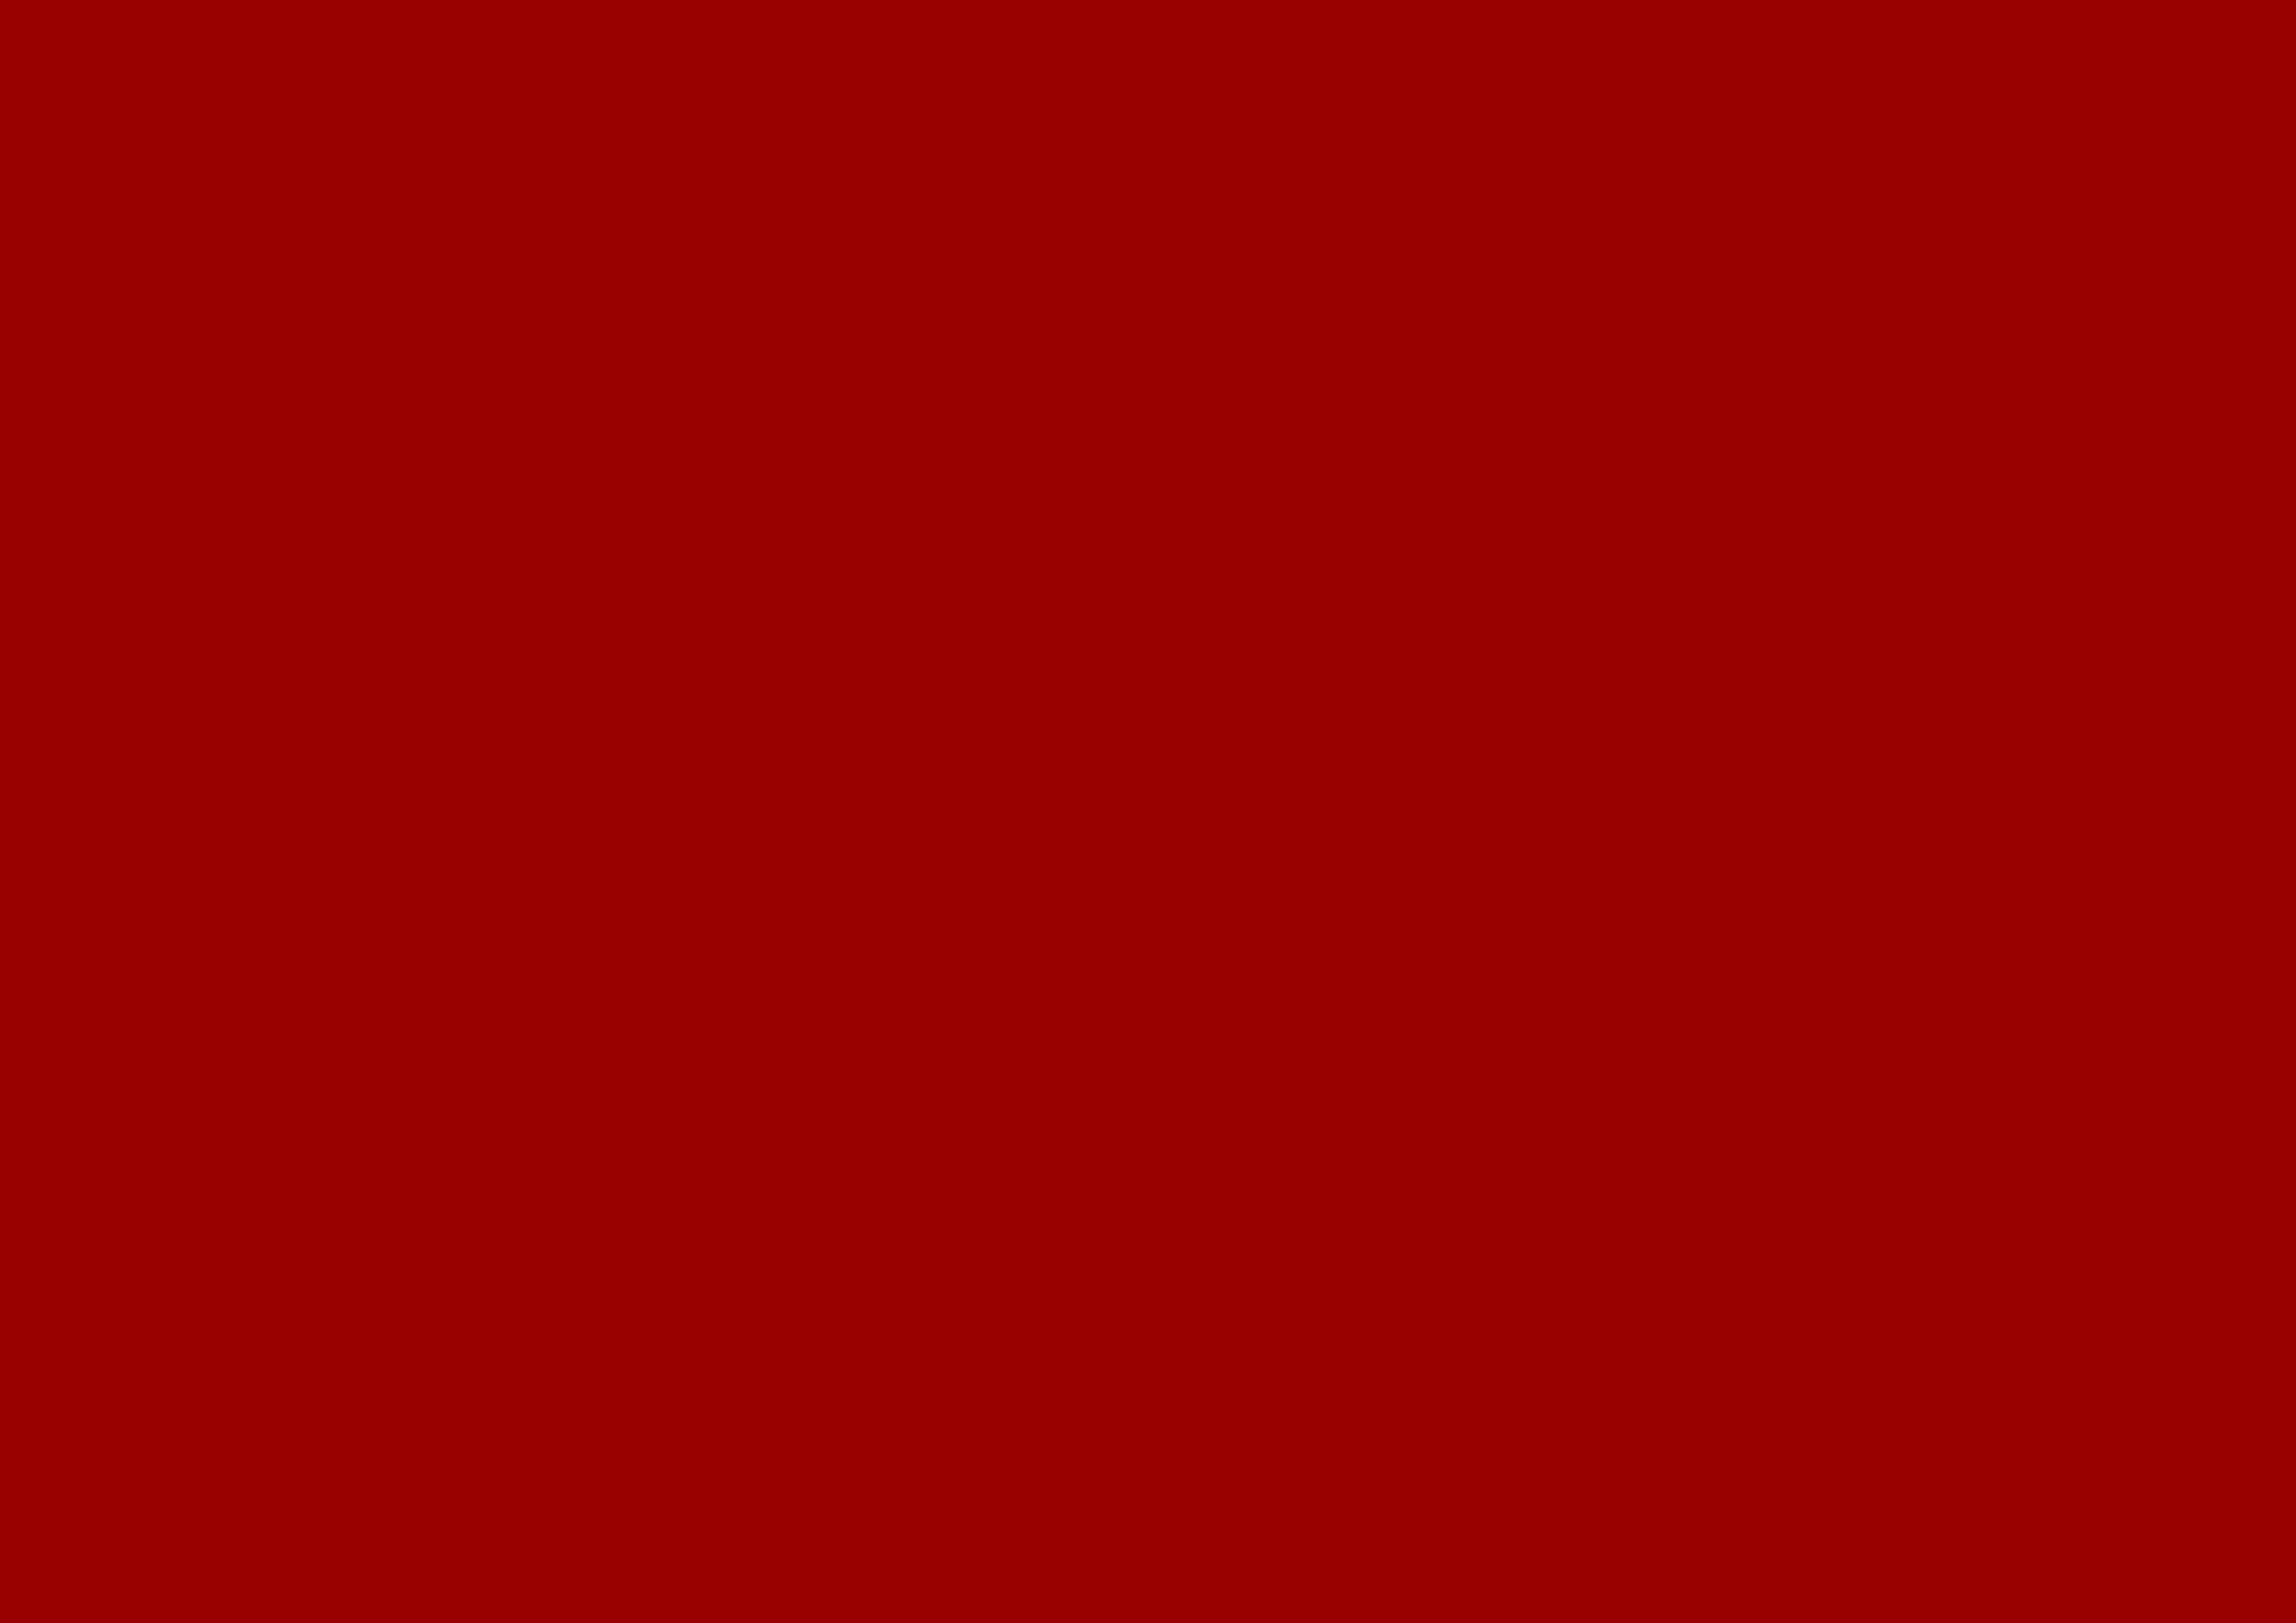 3508x2480 Stizza Solid Color Background